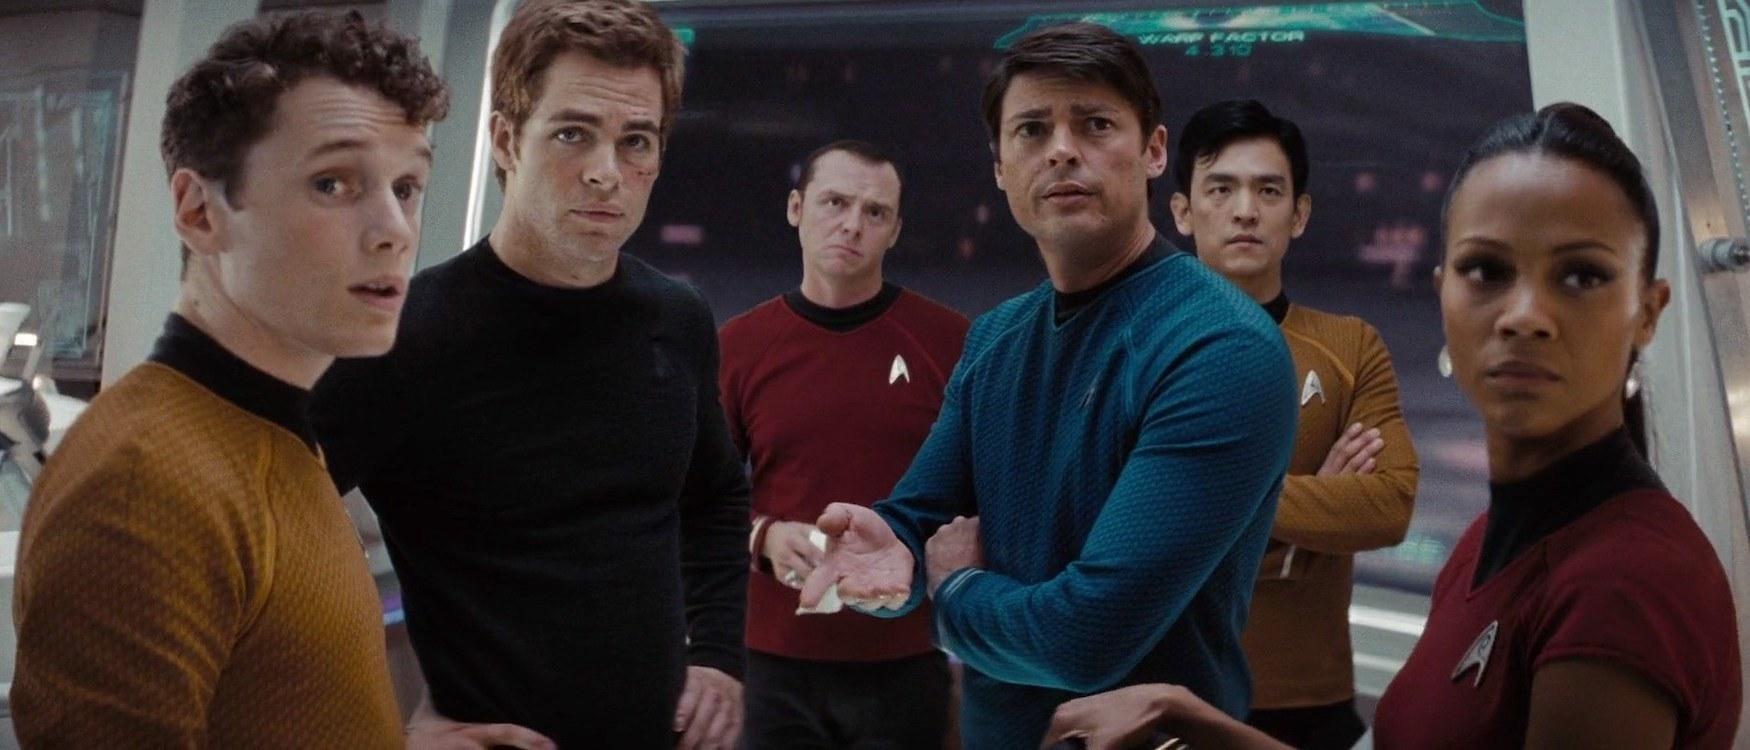 The new Enterprise team (from left to right: Anton Yelchin, Chris Pine, Simon Pegg, Karl Urban, John Cho, Zoey Saldana) look on to the adventure that lies ahead.